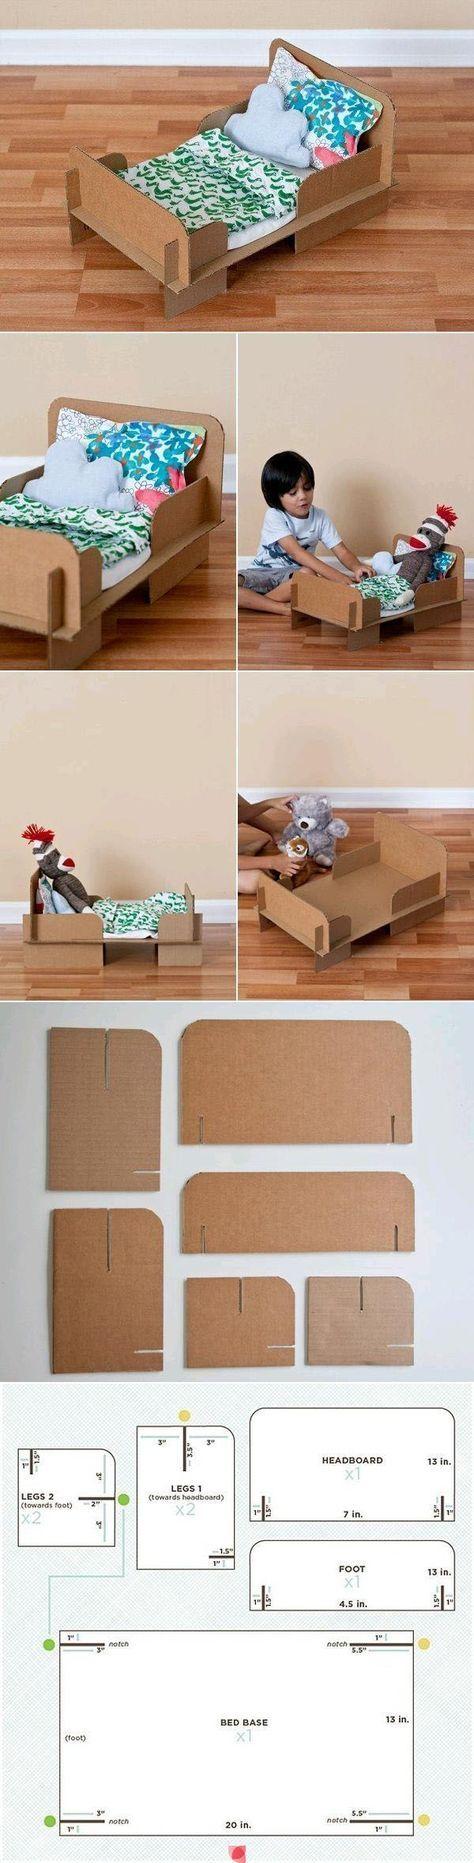 DIY Card Board Toy Bed